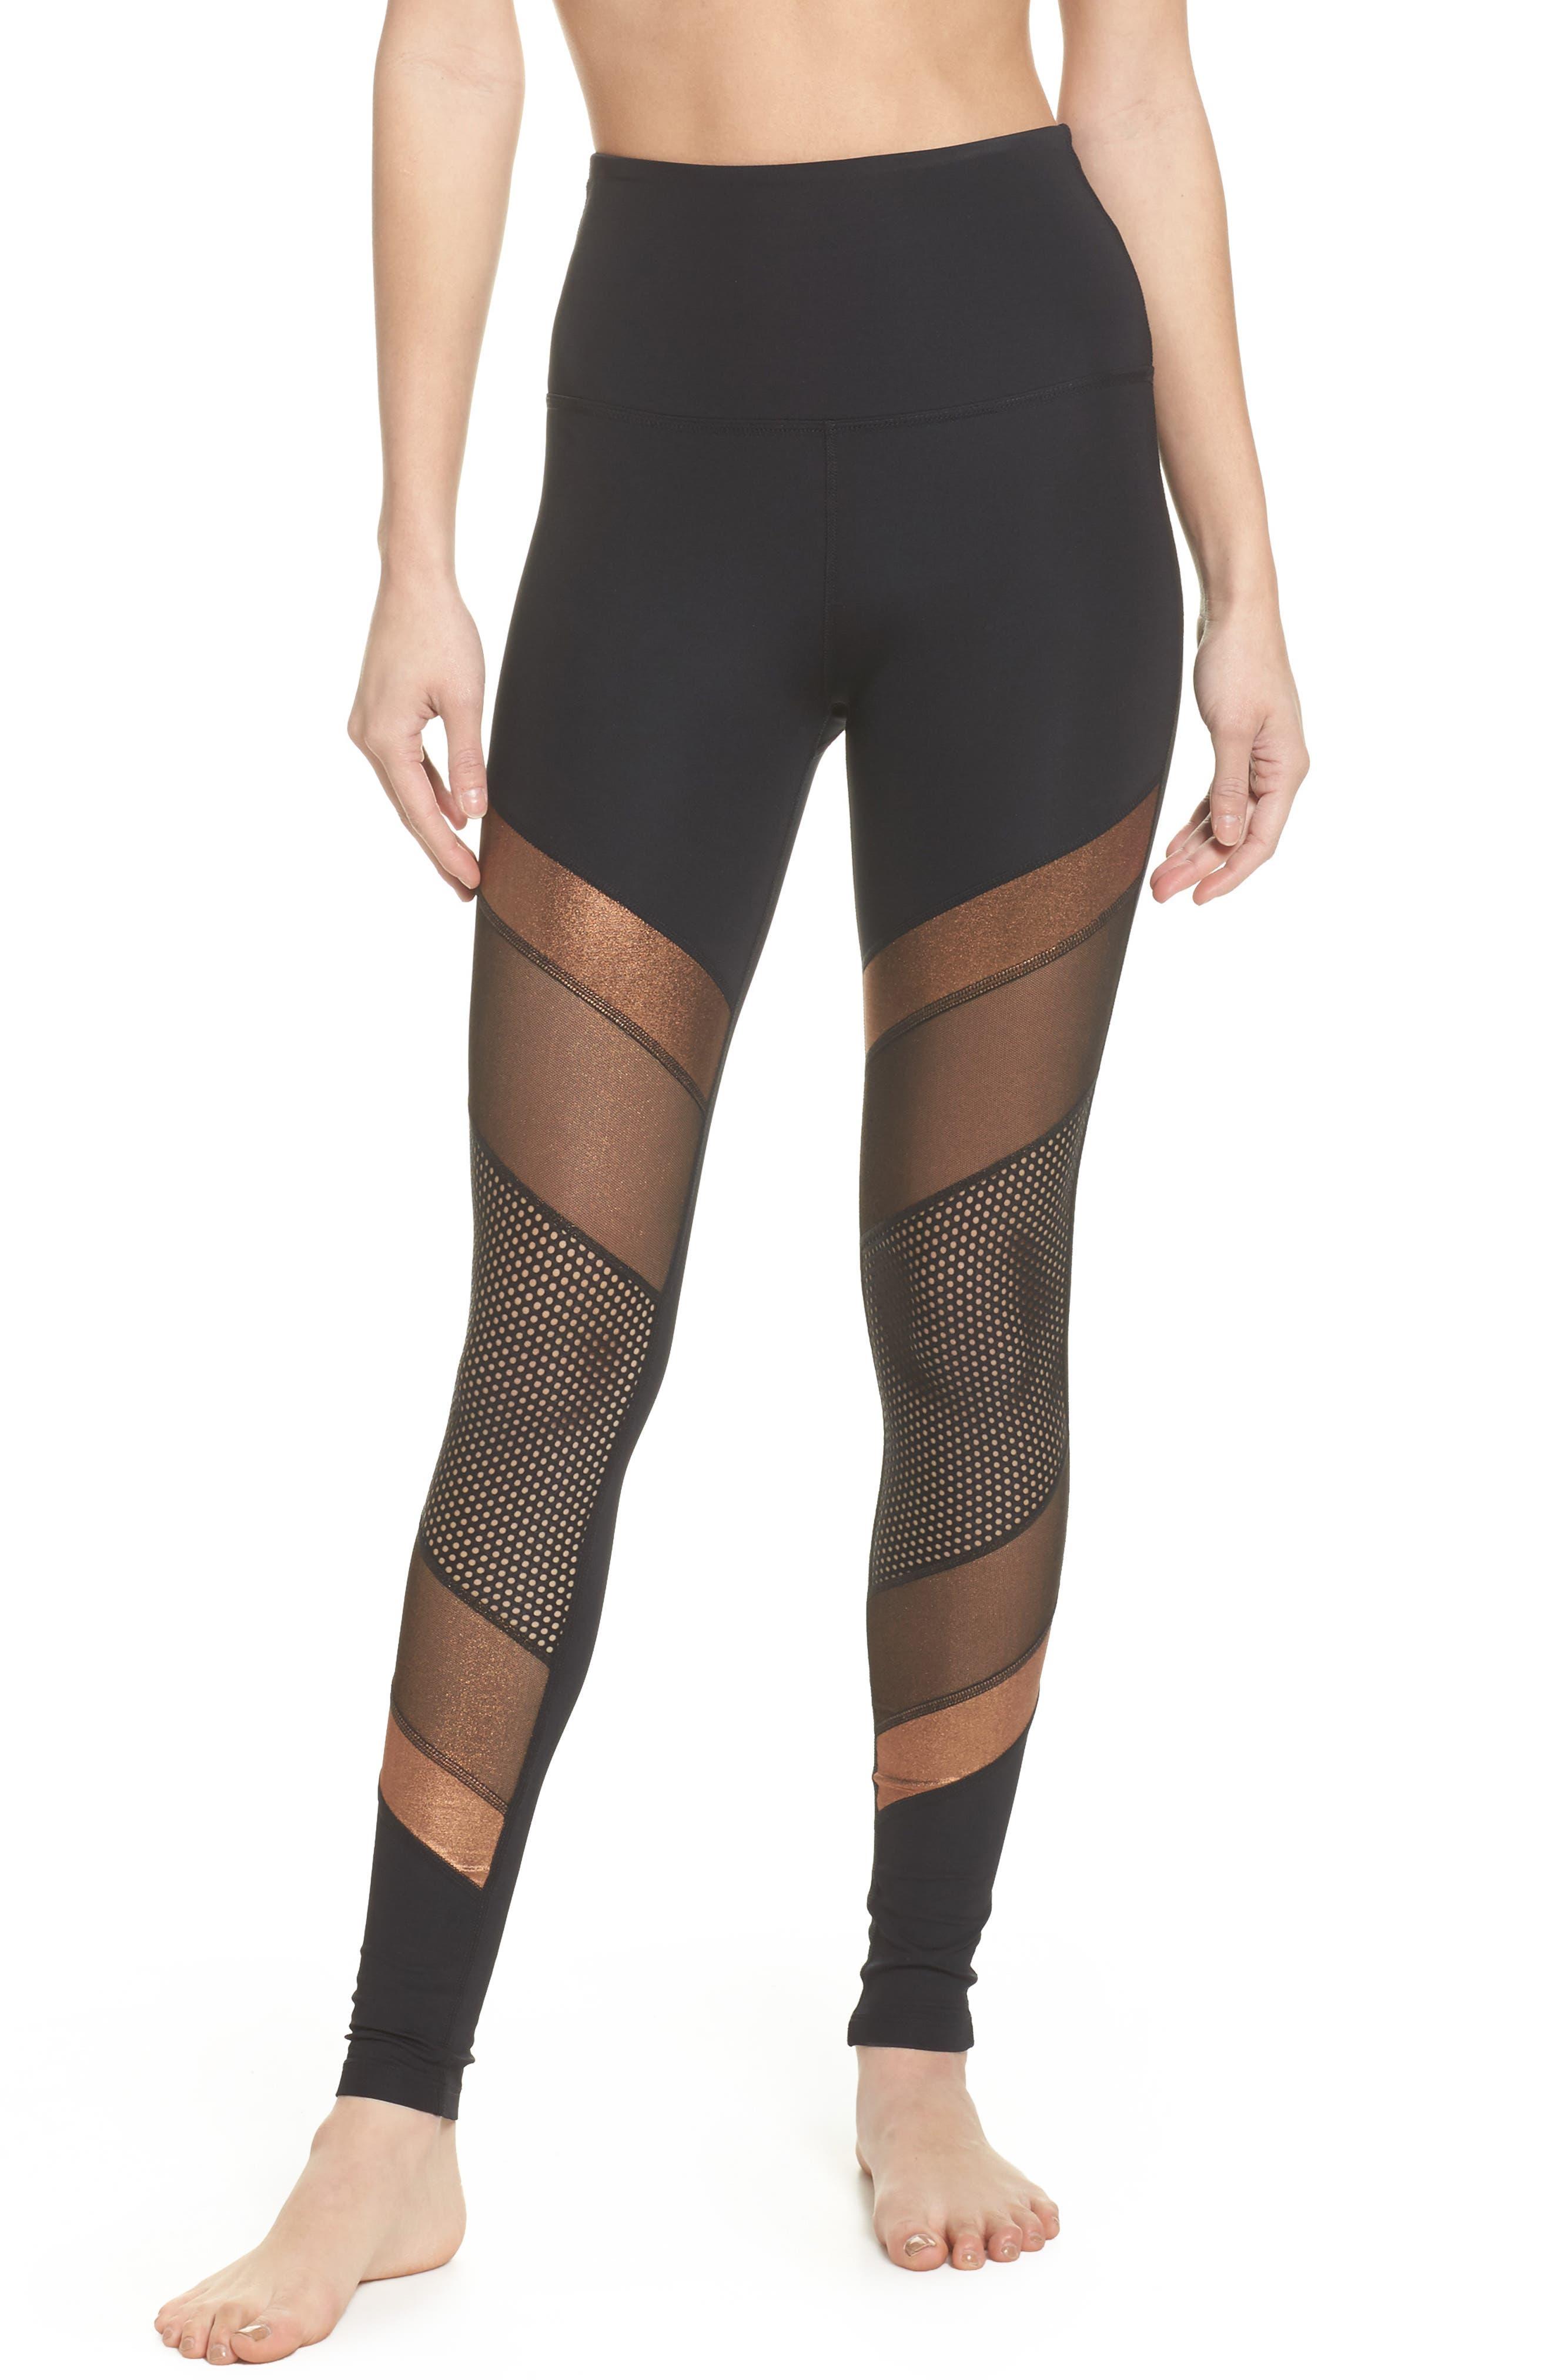 Soleil High Waist Leggings,                         Main,                         color, Black